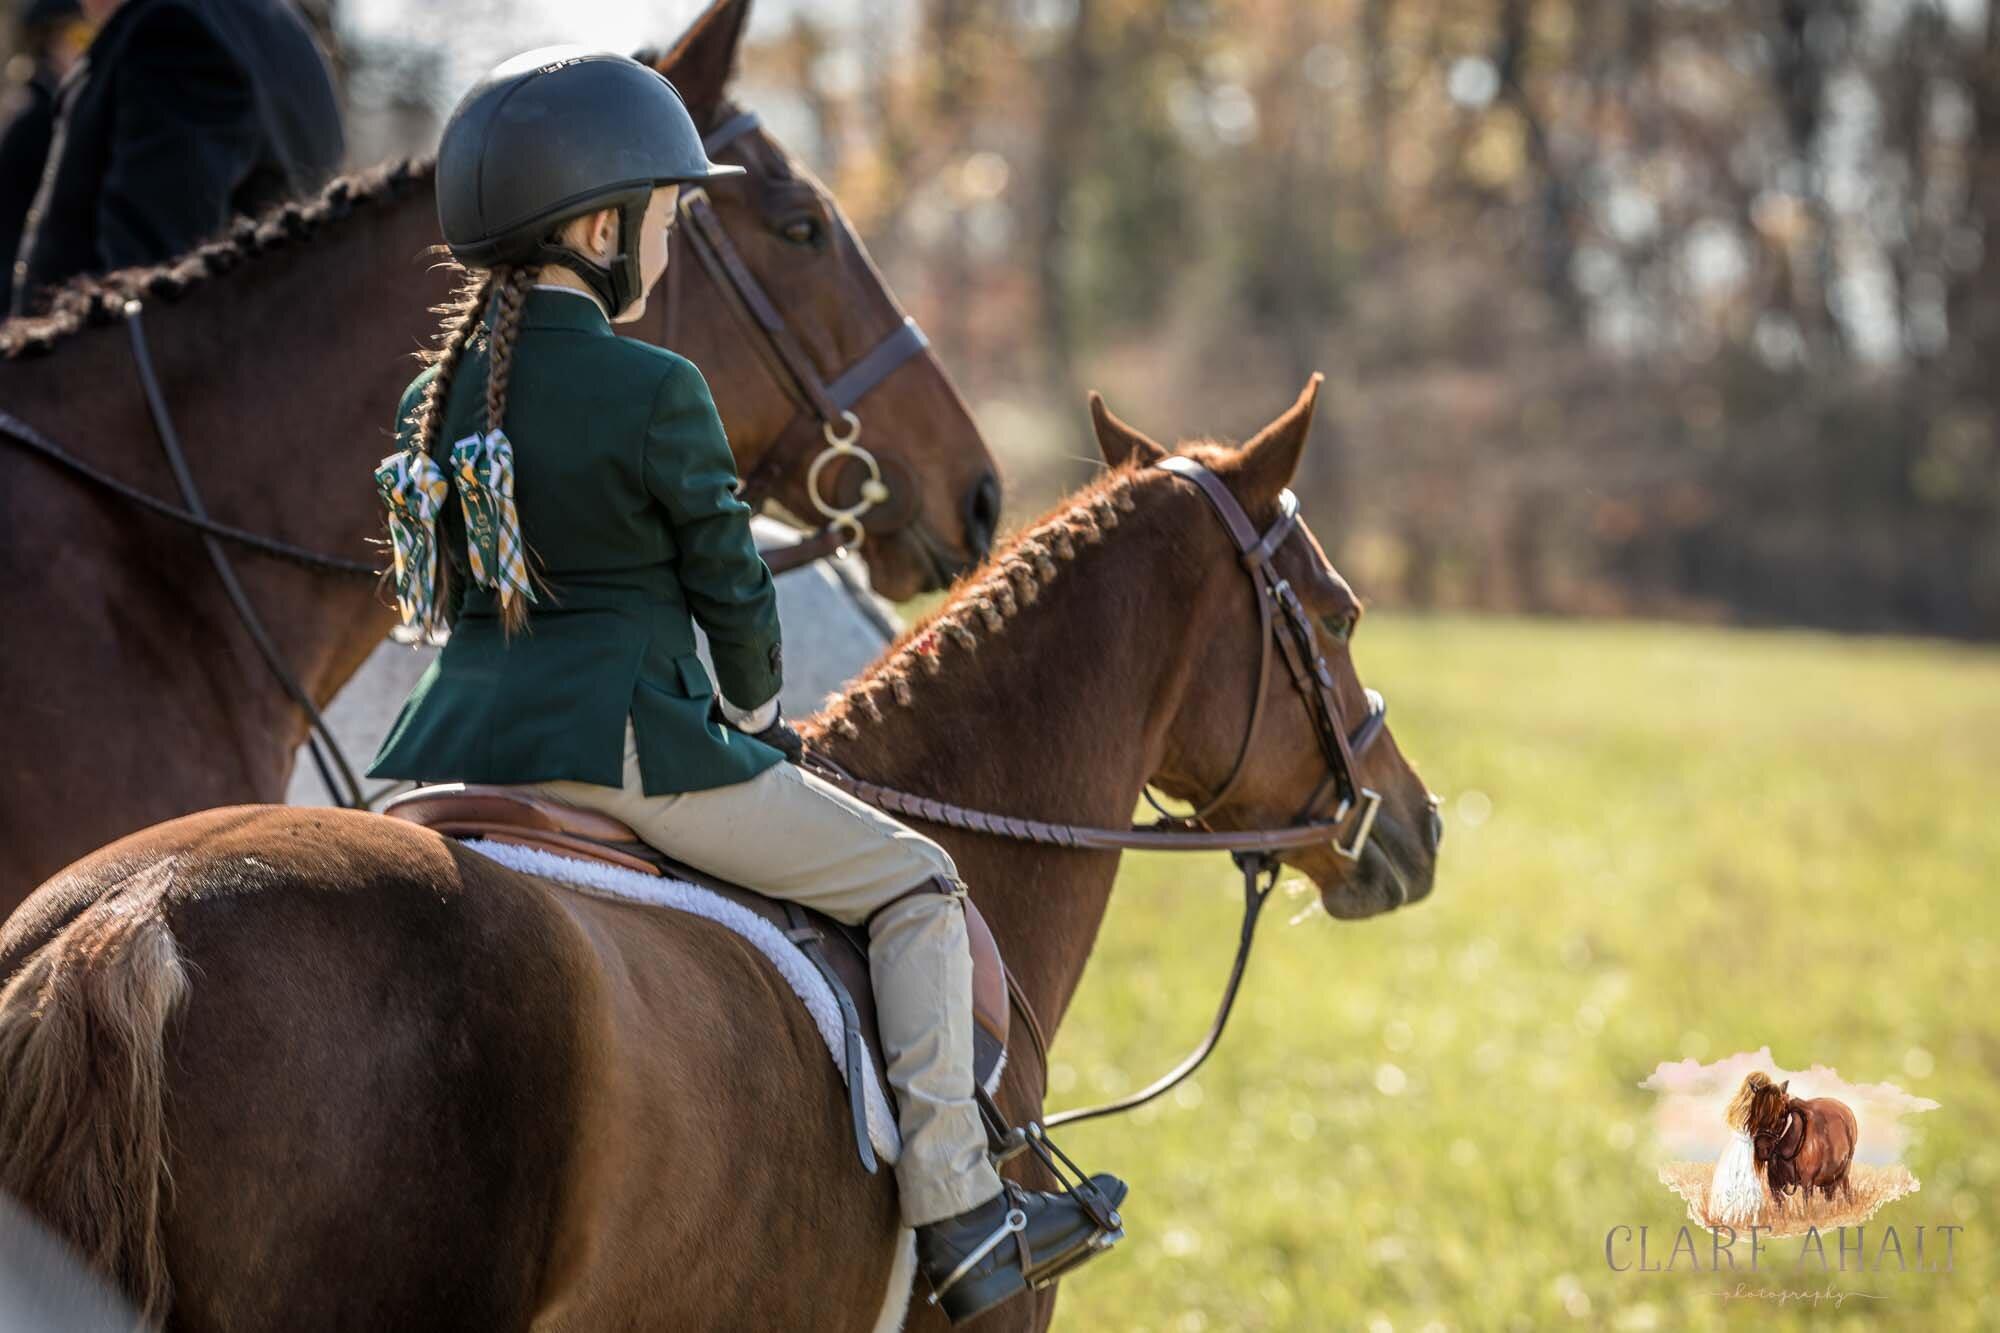 equine_photographer_potomac_md_equine_photographer_middleburg_VA_equine_portraiture_loudon_county_VA-1199.jpg